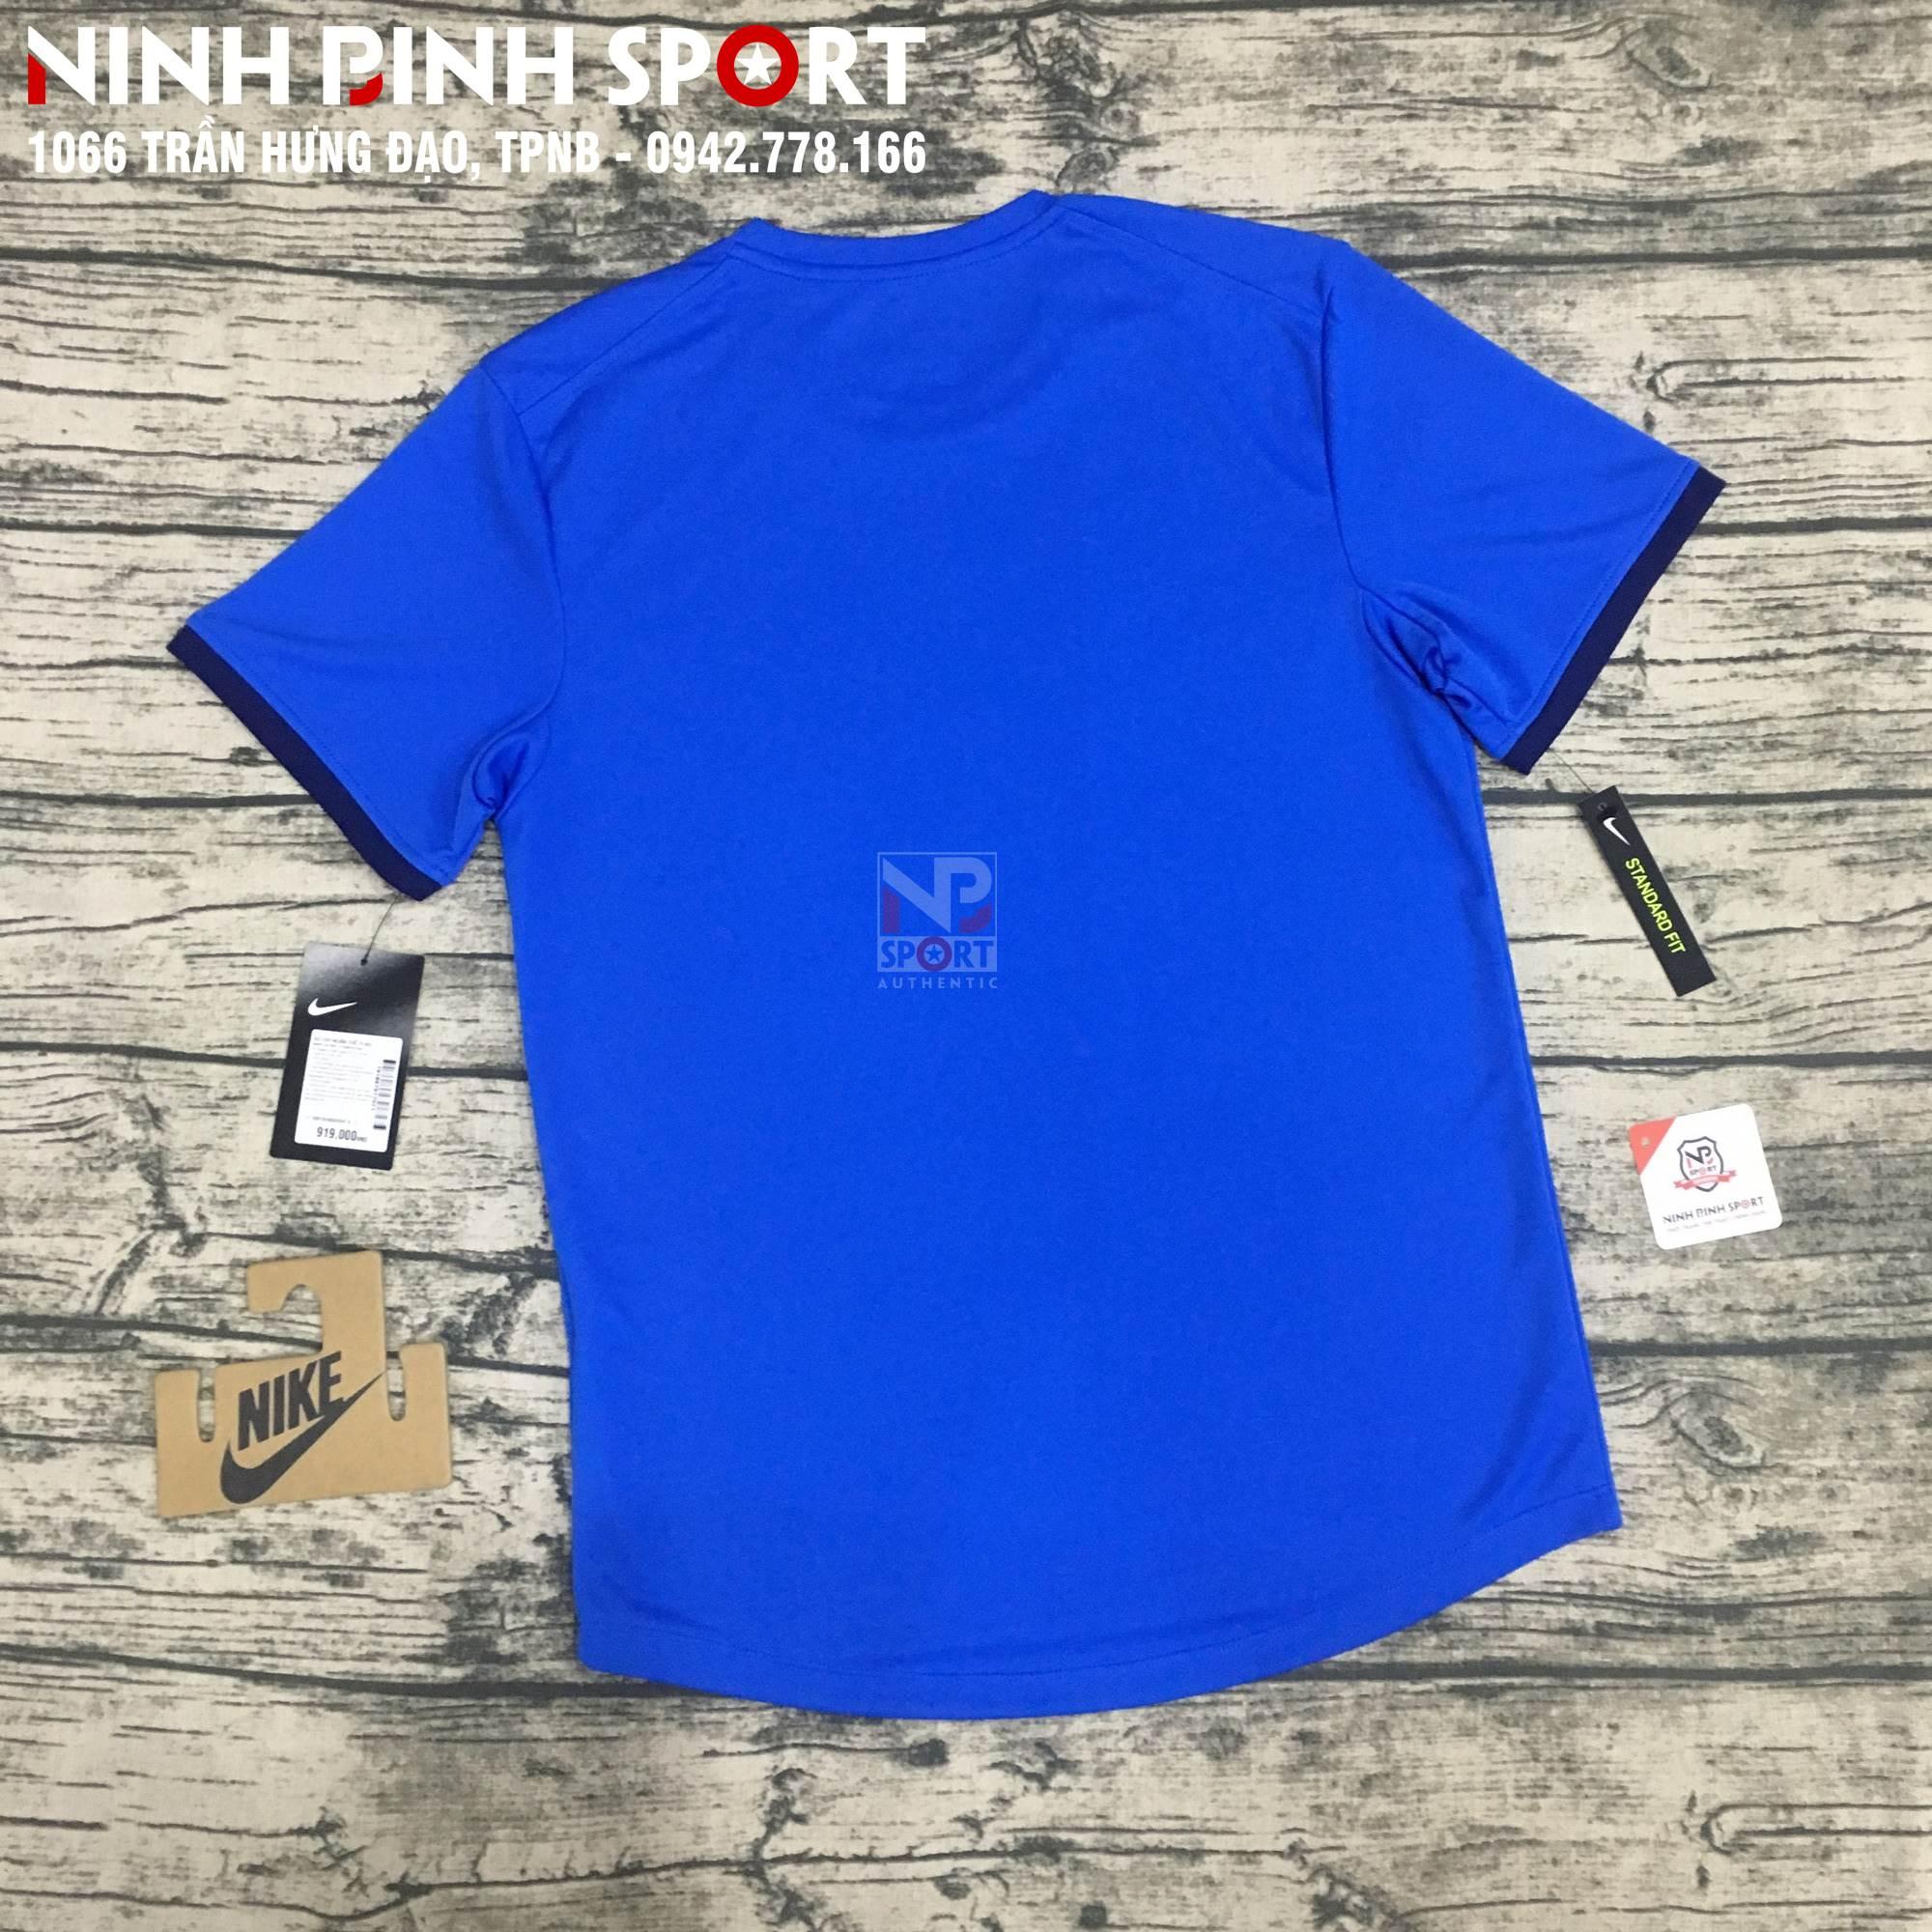 Áo thể thao nam Nike Dri-Fit S/S Top Blue 939135-403